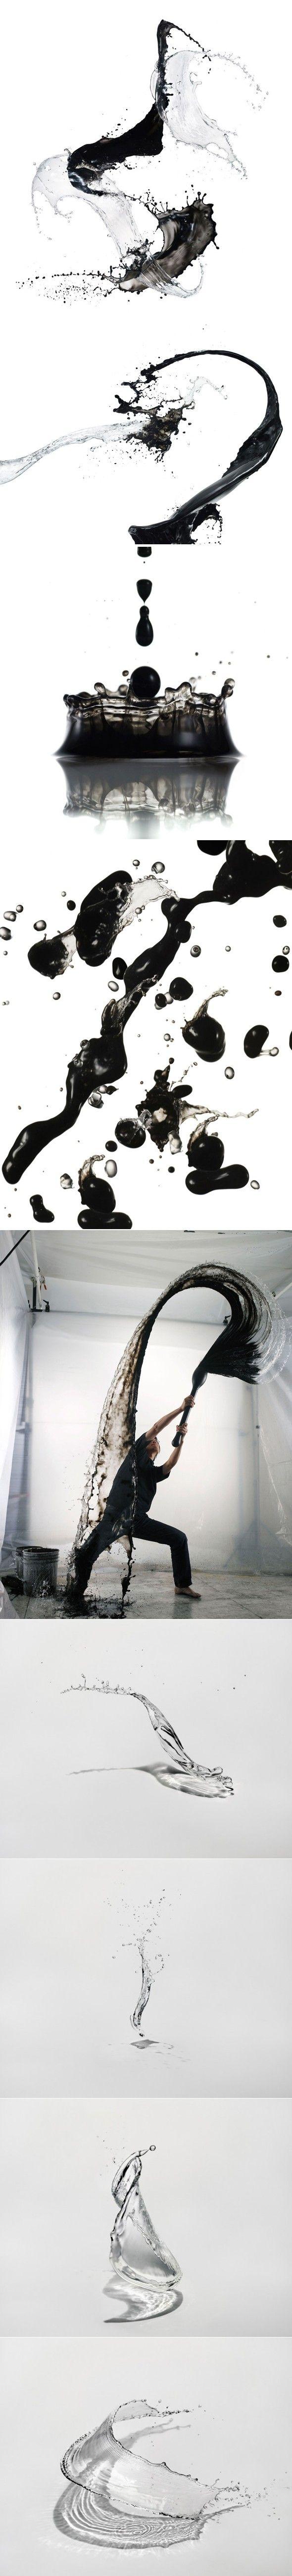 Shinichi Maruyama présente Water Sculptures et Kusho - Journal du Design